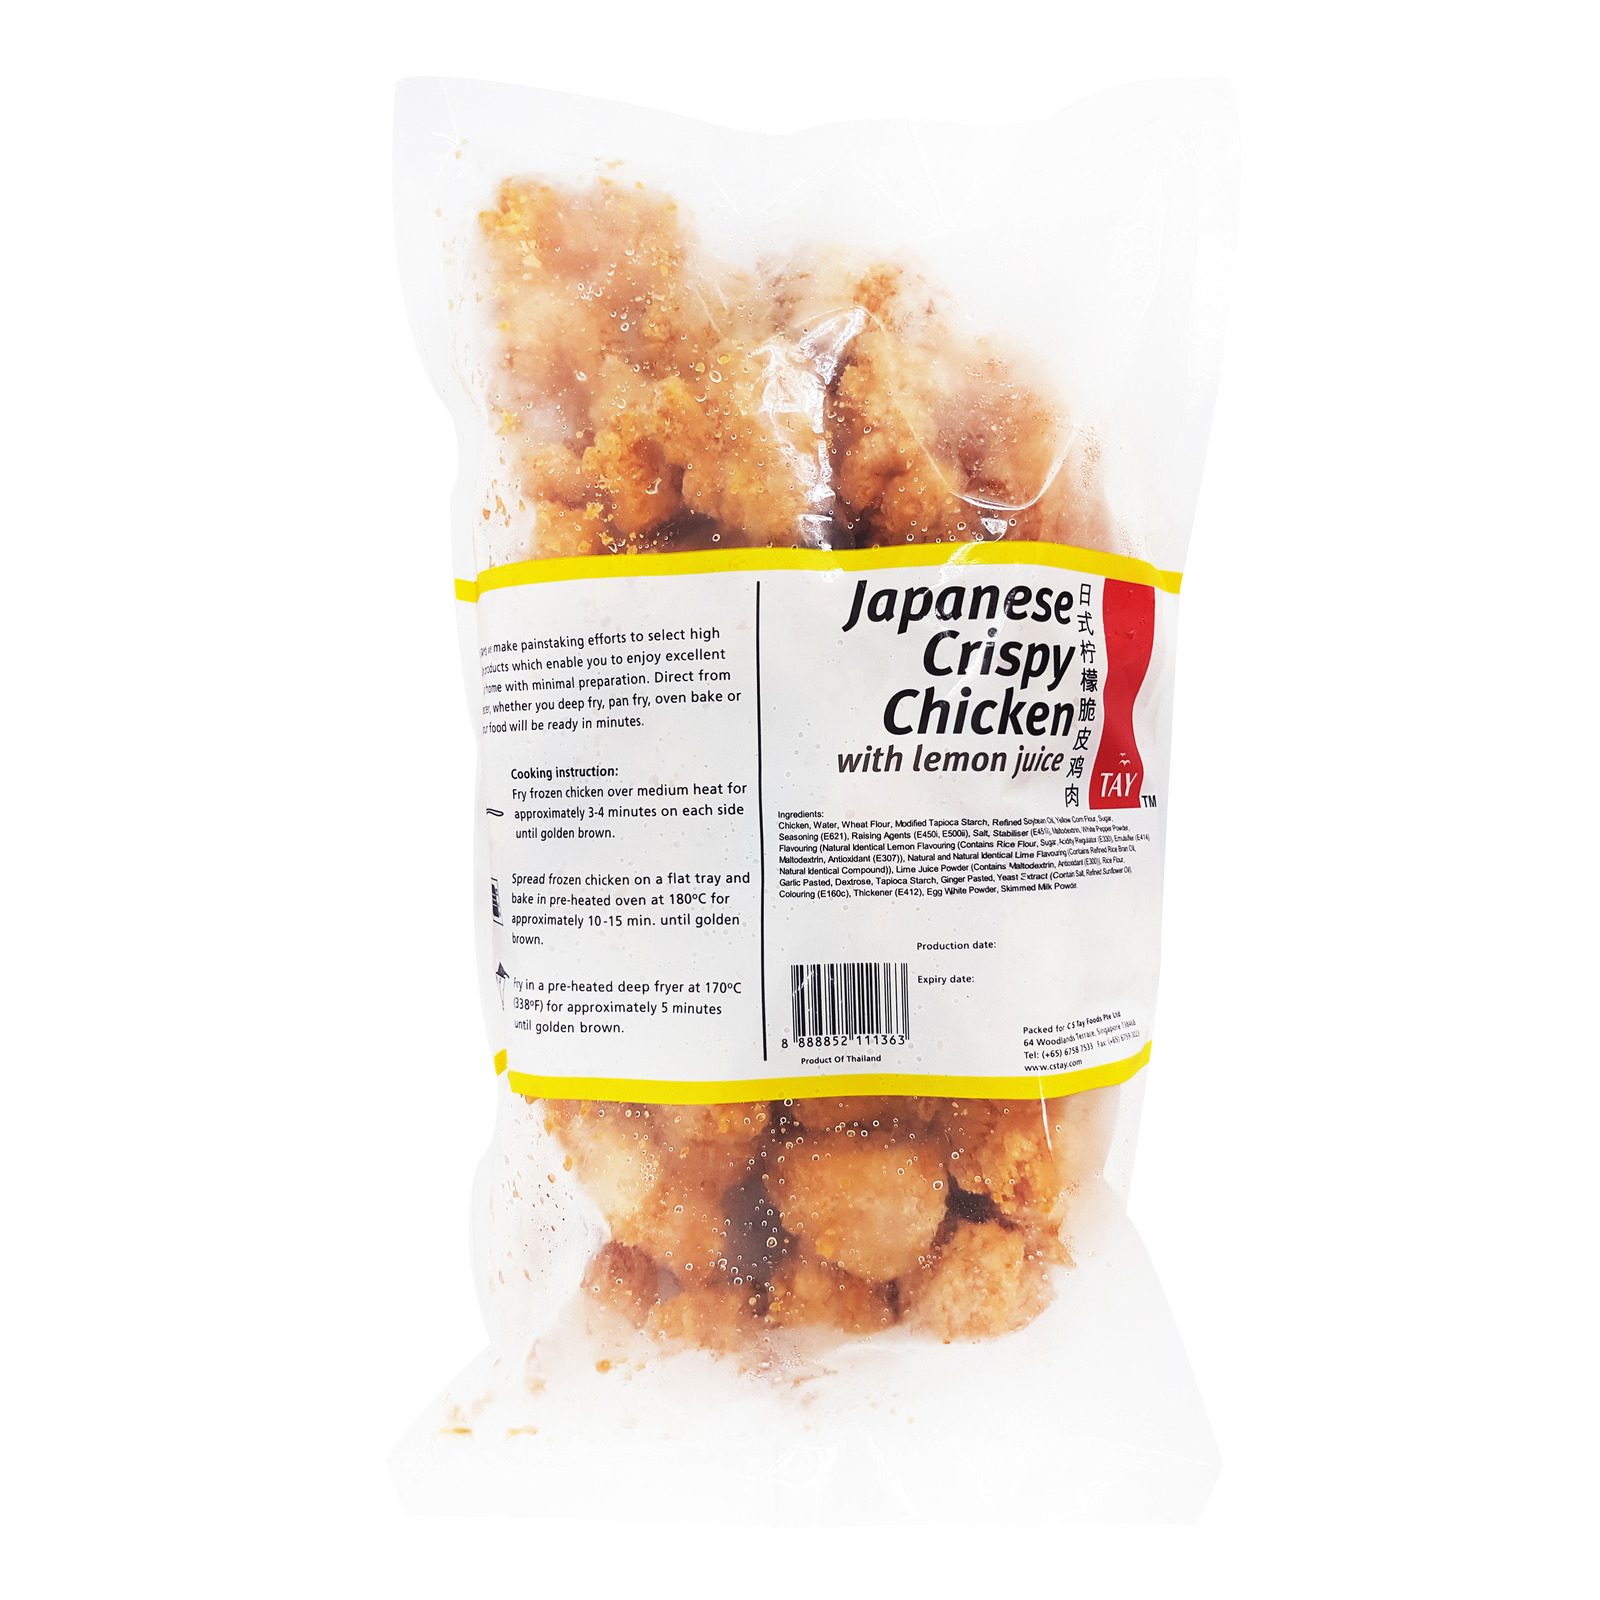 Tay's Japanese Crispy Chicken - Lemon Juice | NTUC FairPrice